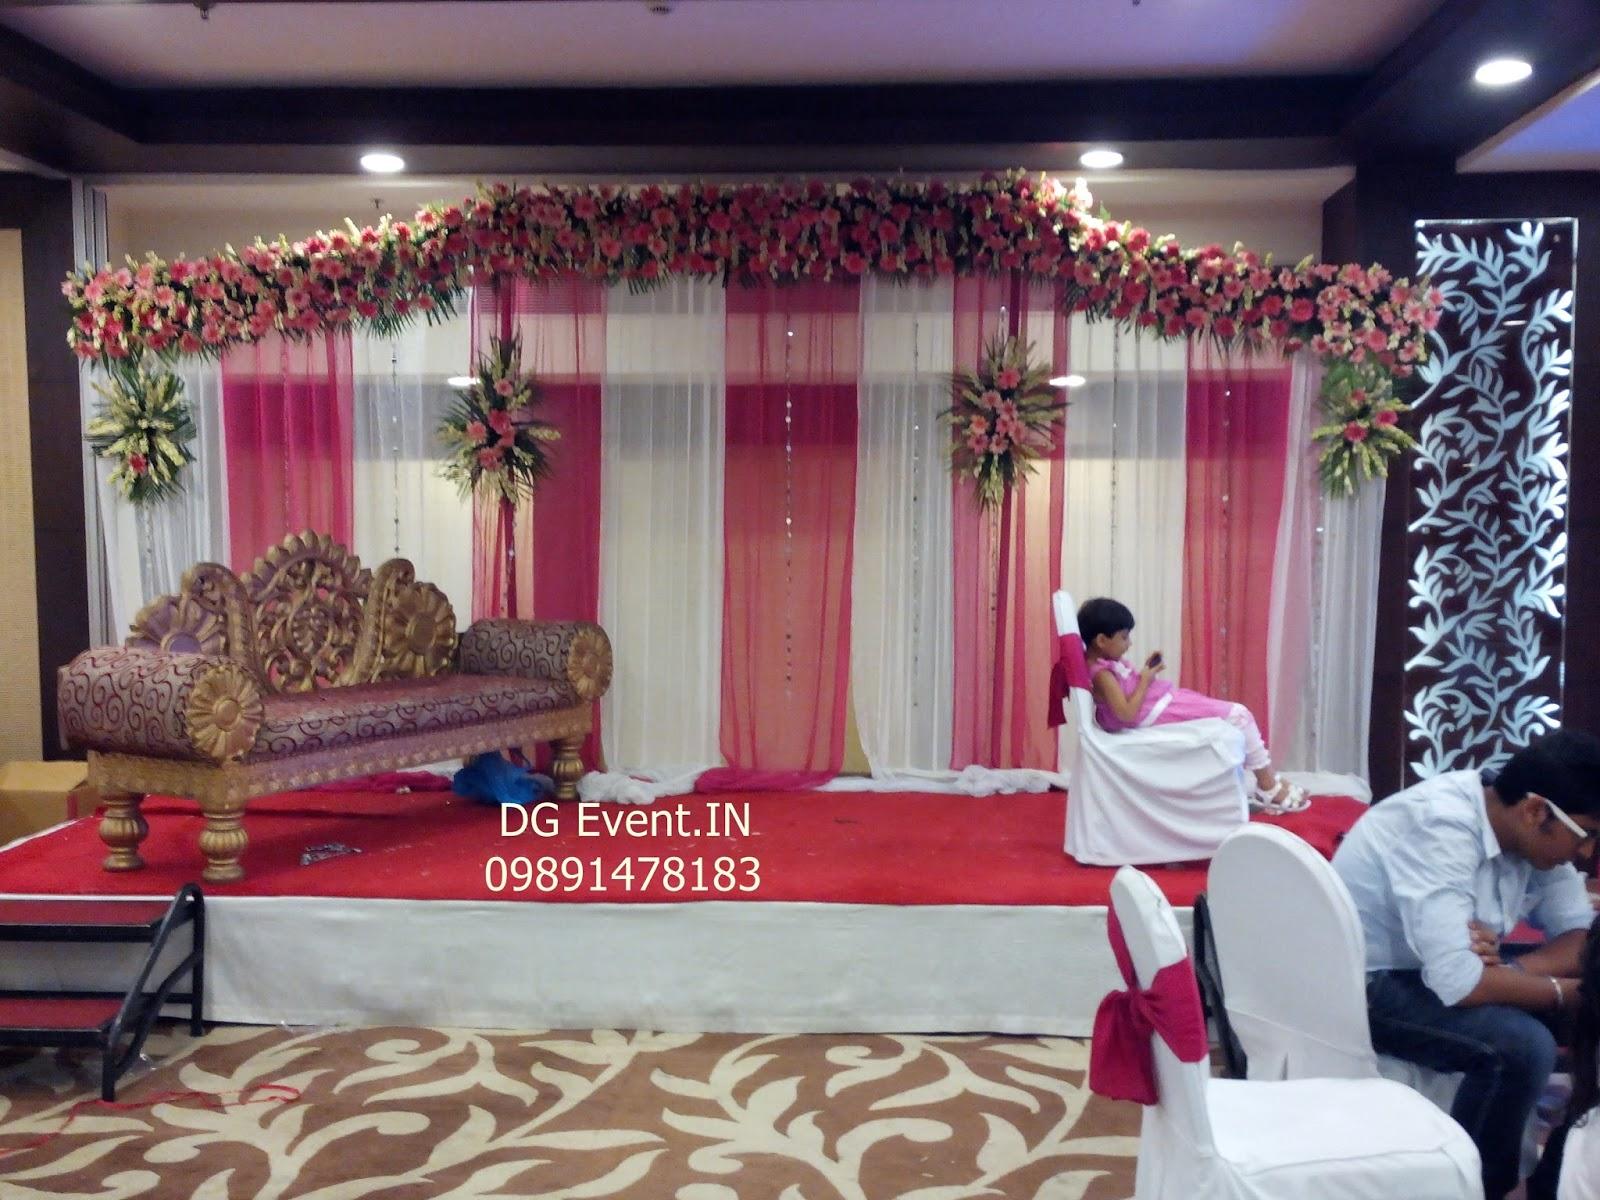 Hotel Banquet Hall Flower Decorators Gurgaon